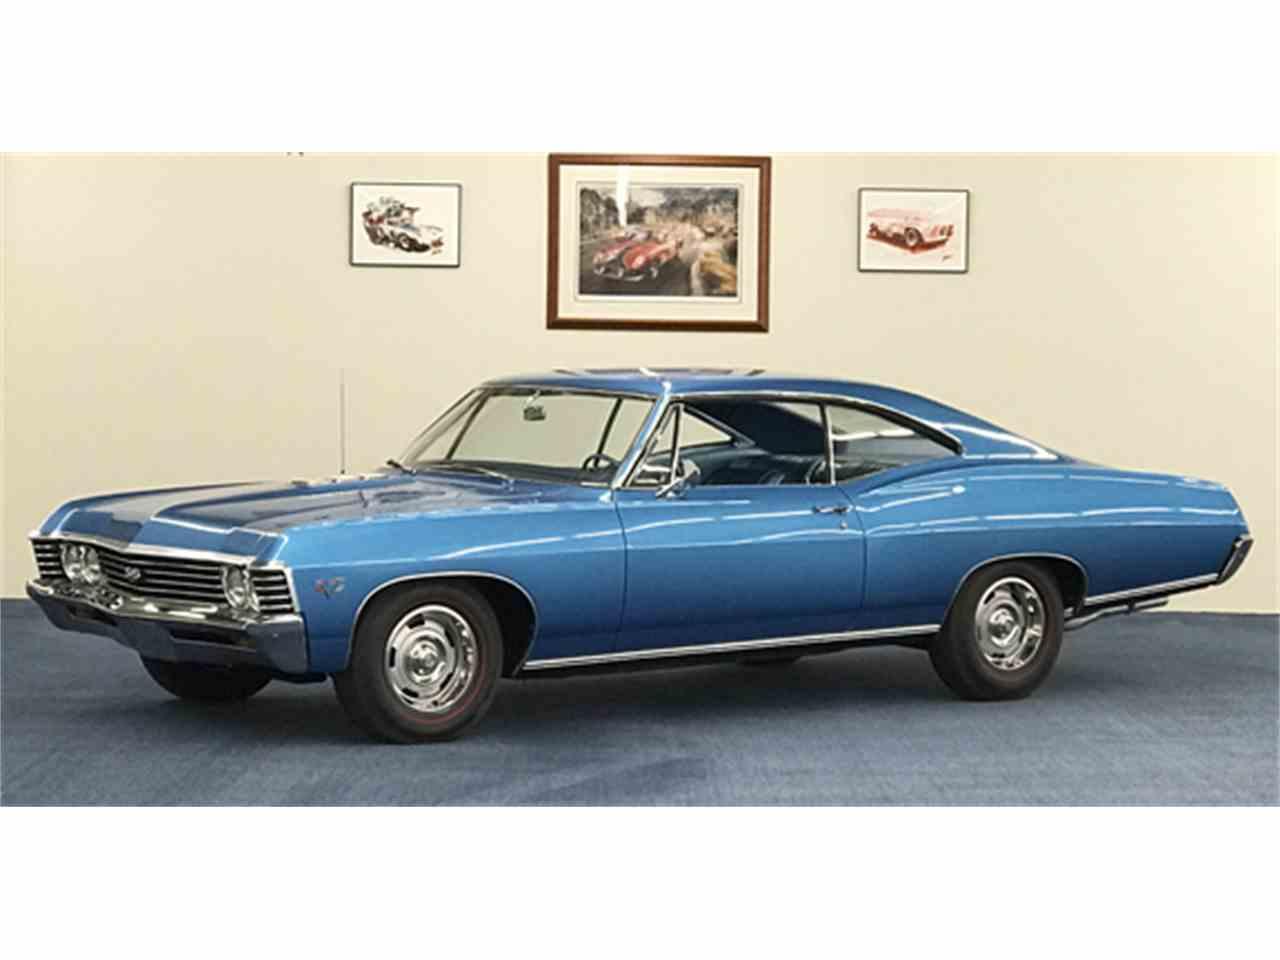 1967 chevrolet impala for sale cc 934570. Black Bedroom Furniture Sets. Home Design Ideas